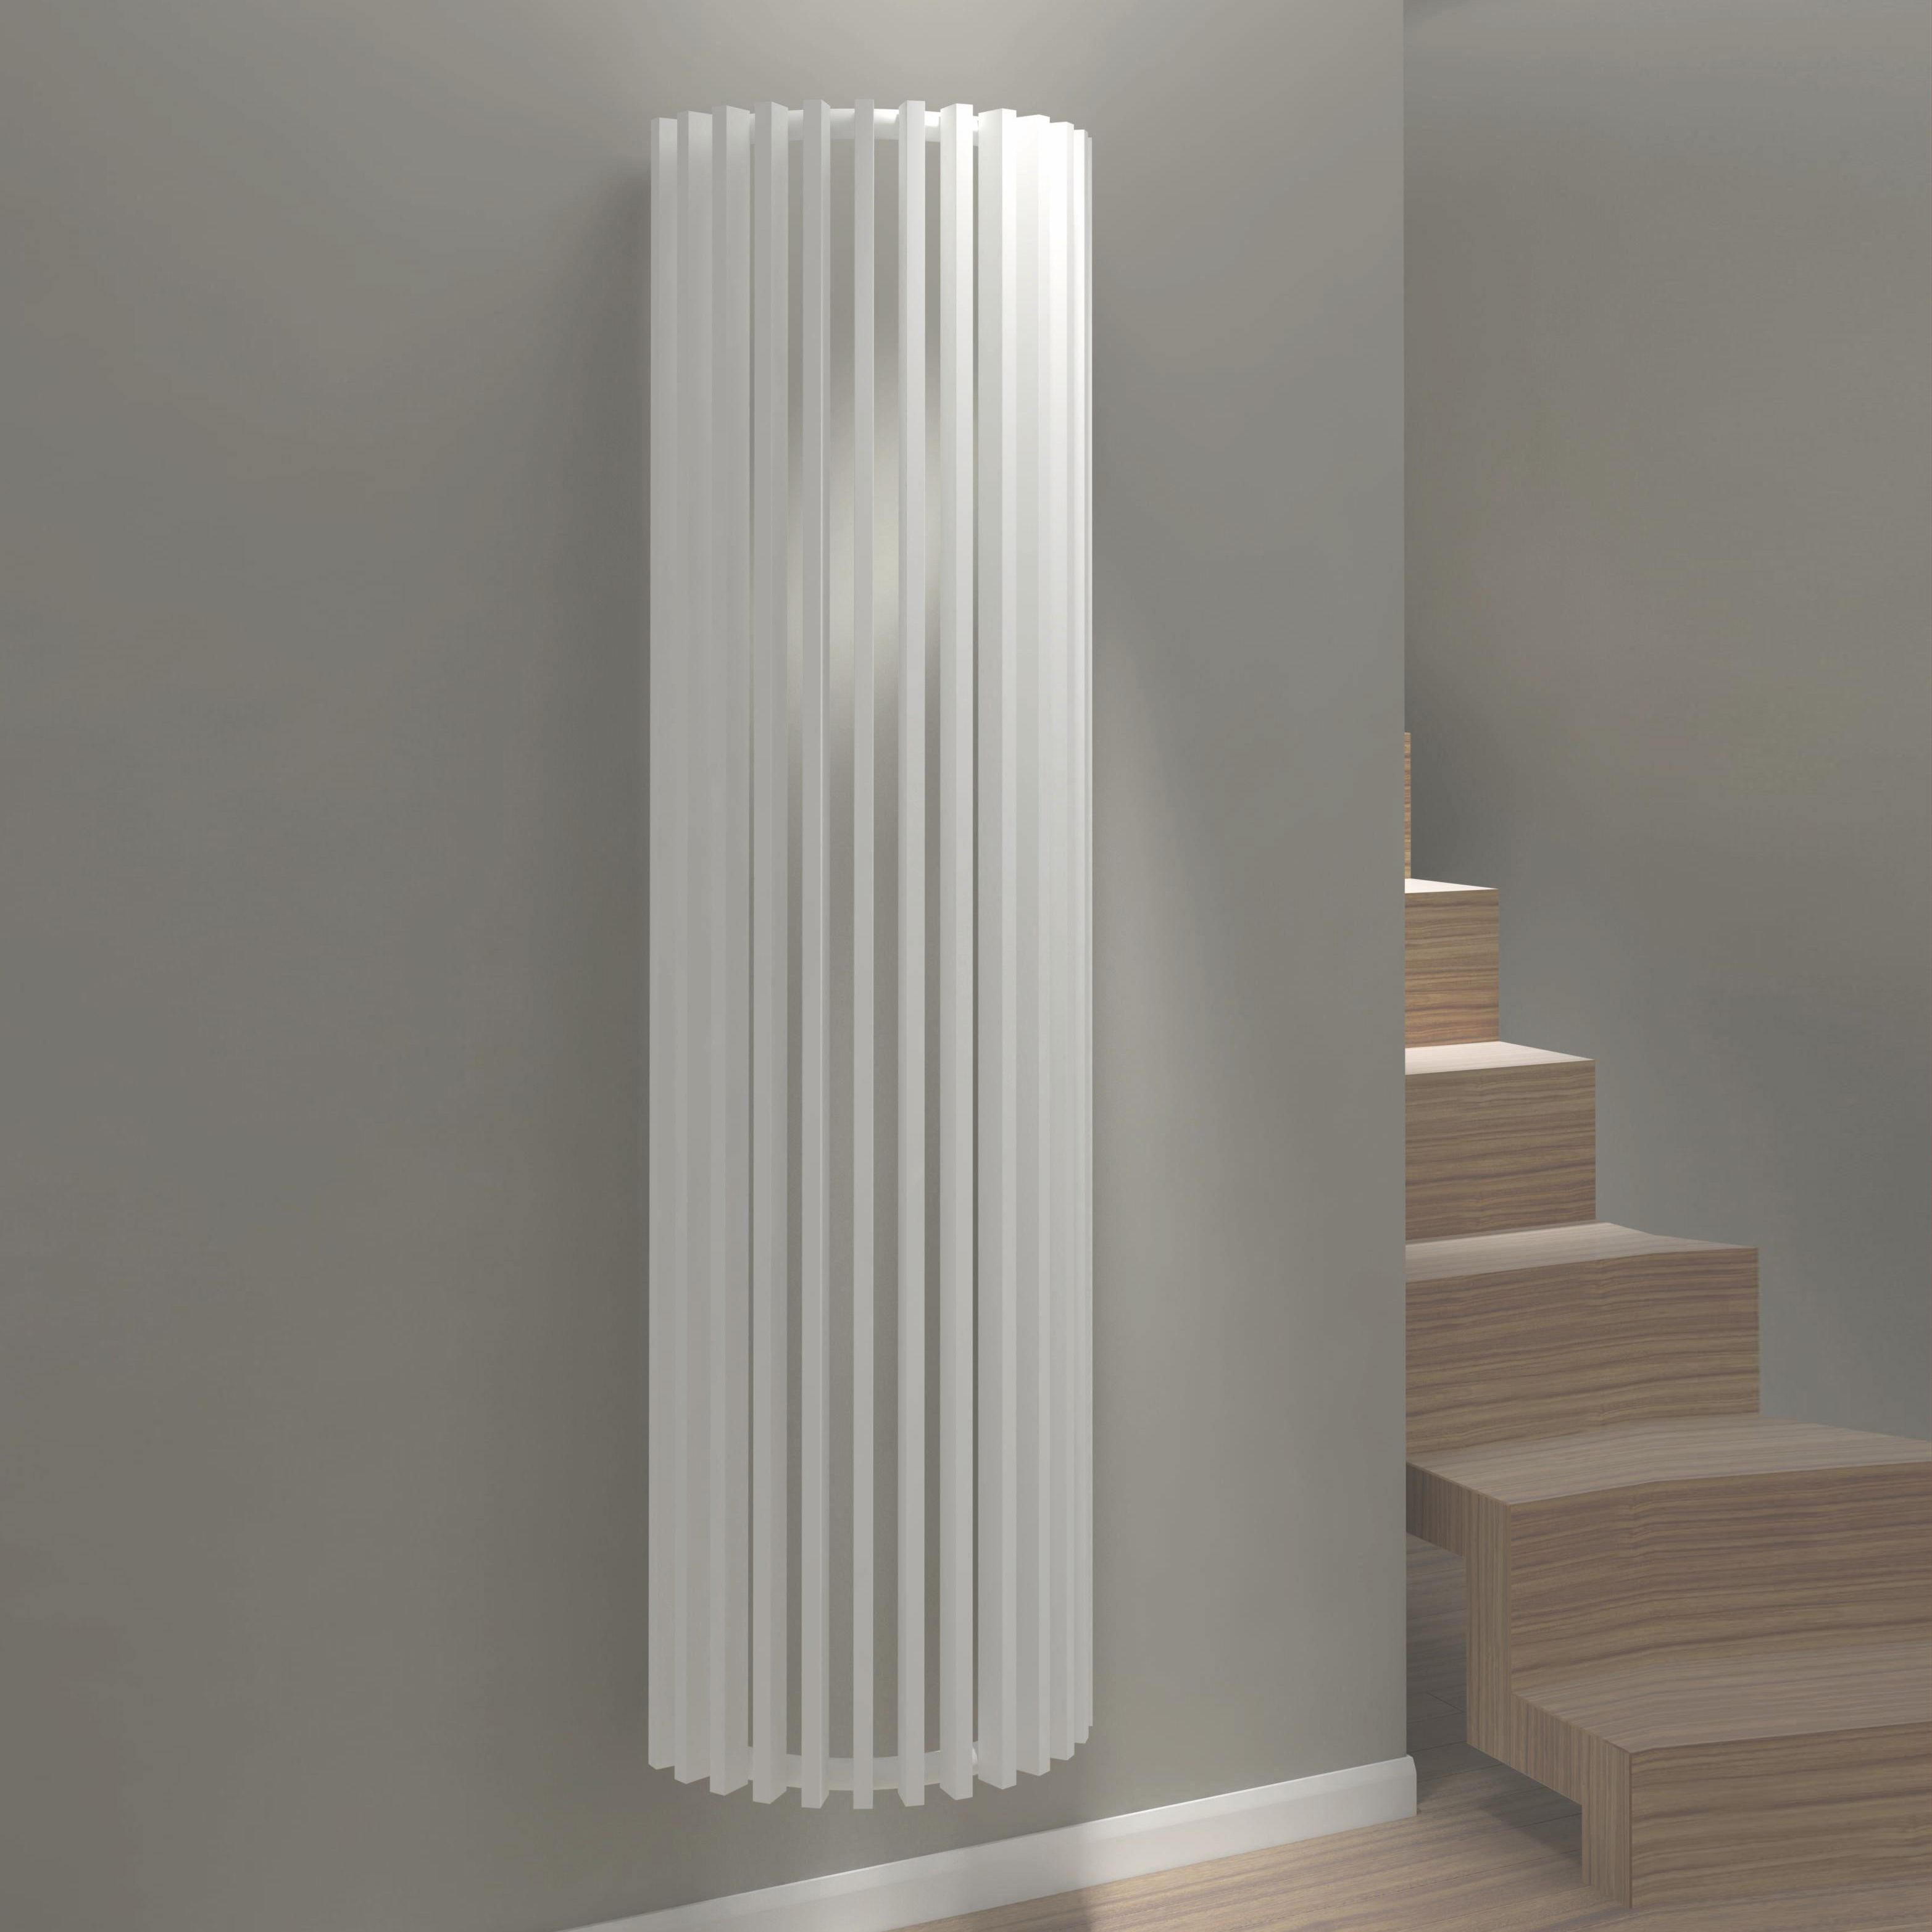 Kudox Tallos Vertical Radiator White (H)1800 mm (W)400